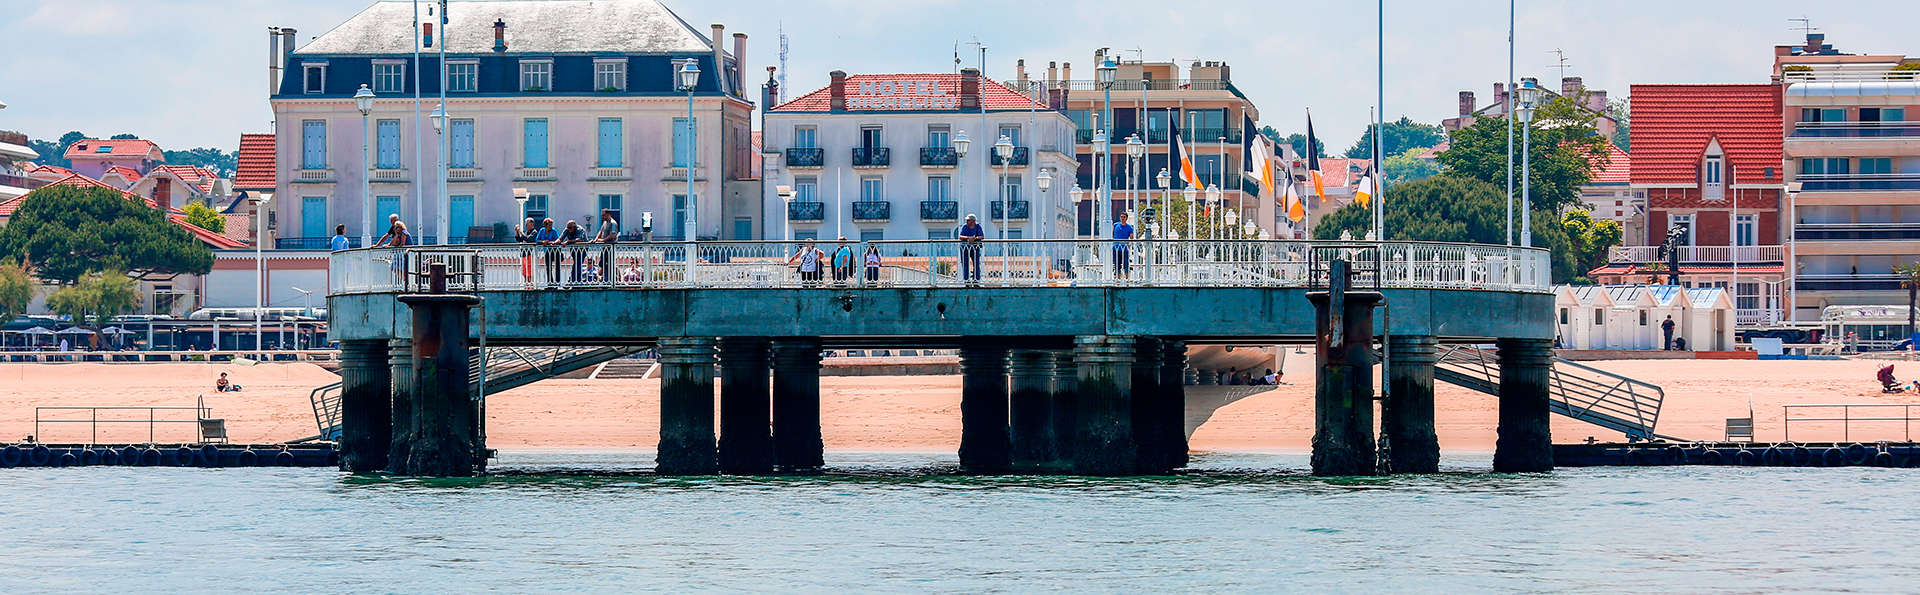 Hôtel les bains d'Arguin & Spa by Thalazur - edit_arcachon1.jpg